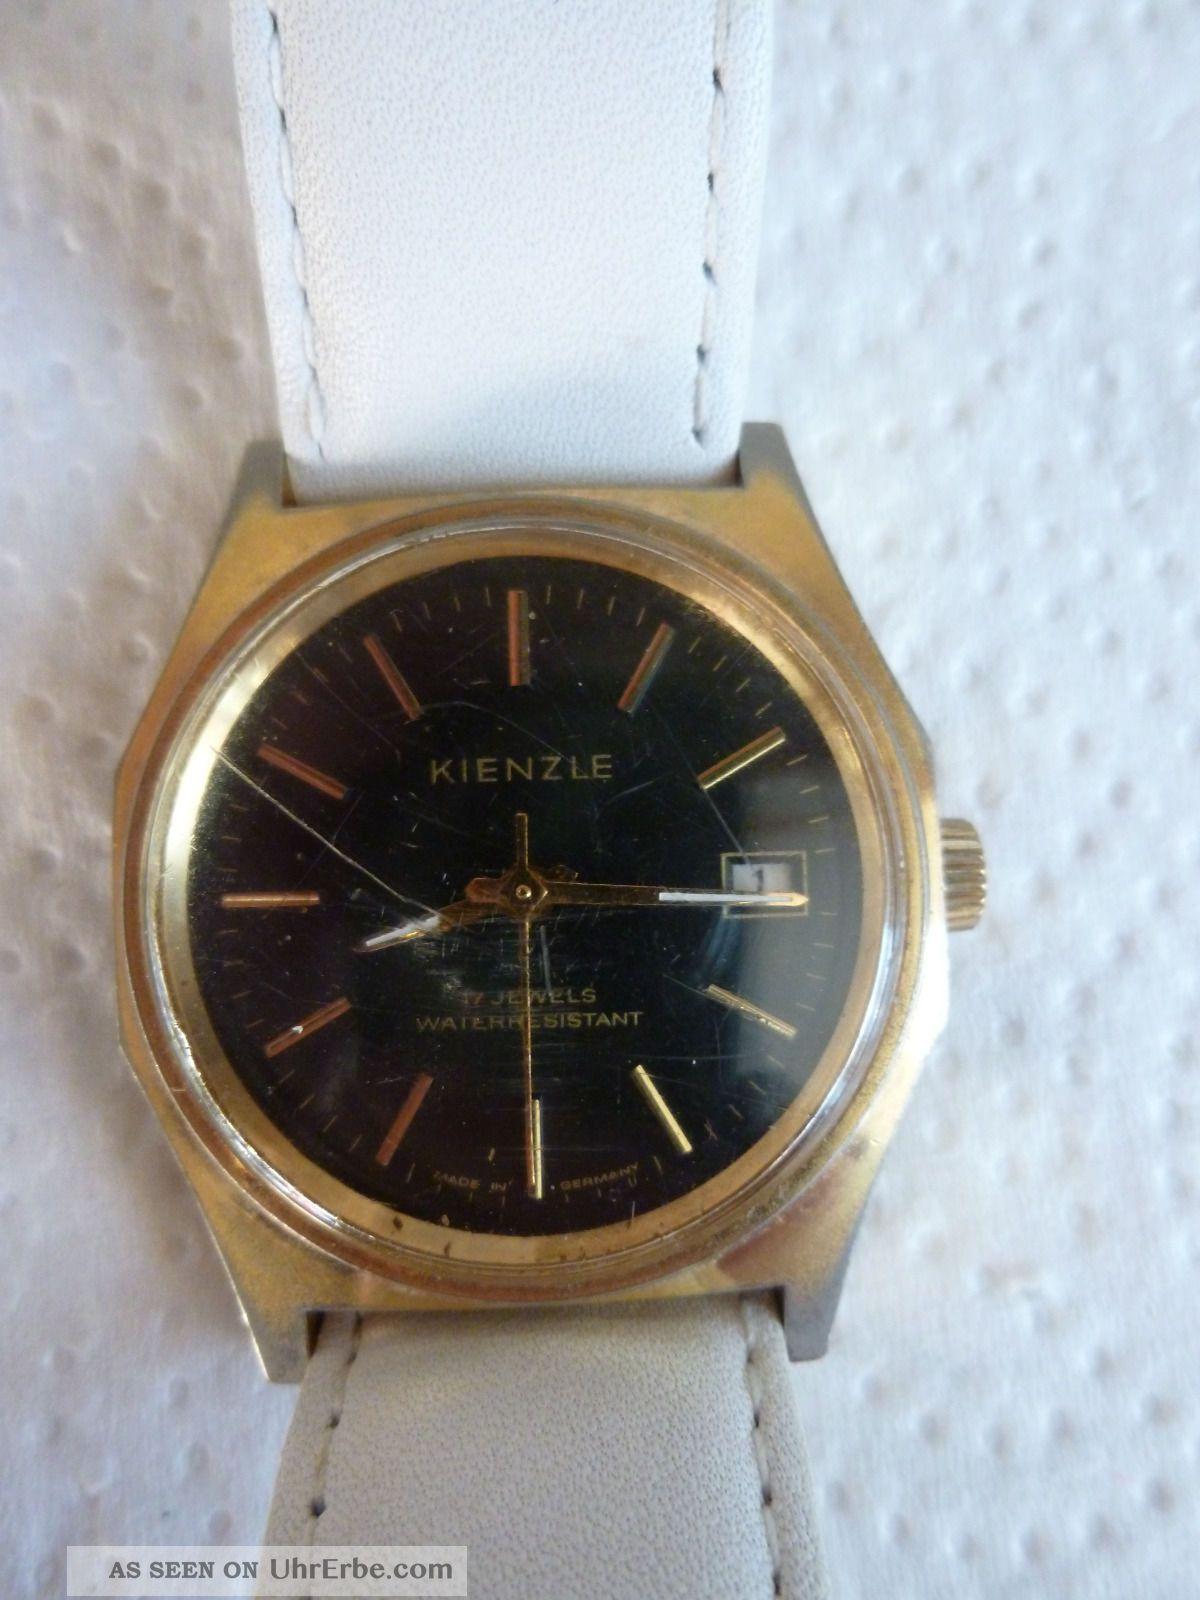 Armbanduhr Aus Papas Sammlung Nr.  26 Kienzle 17 Jewels Mindes 12 Std. Armbanduhren Bild